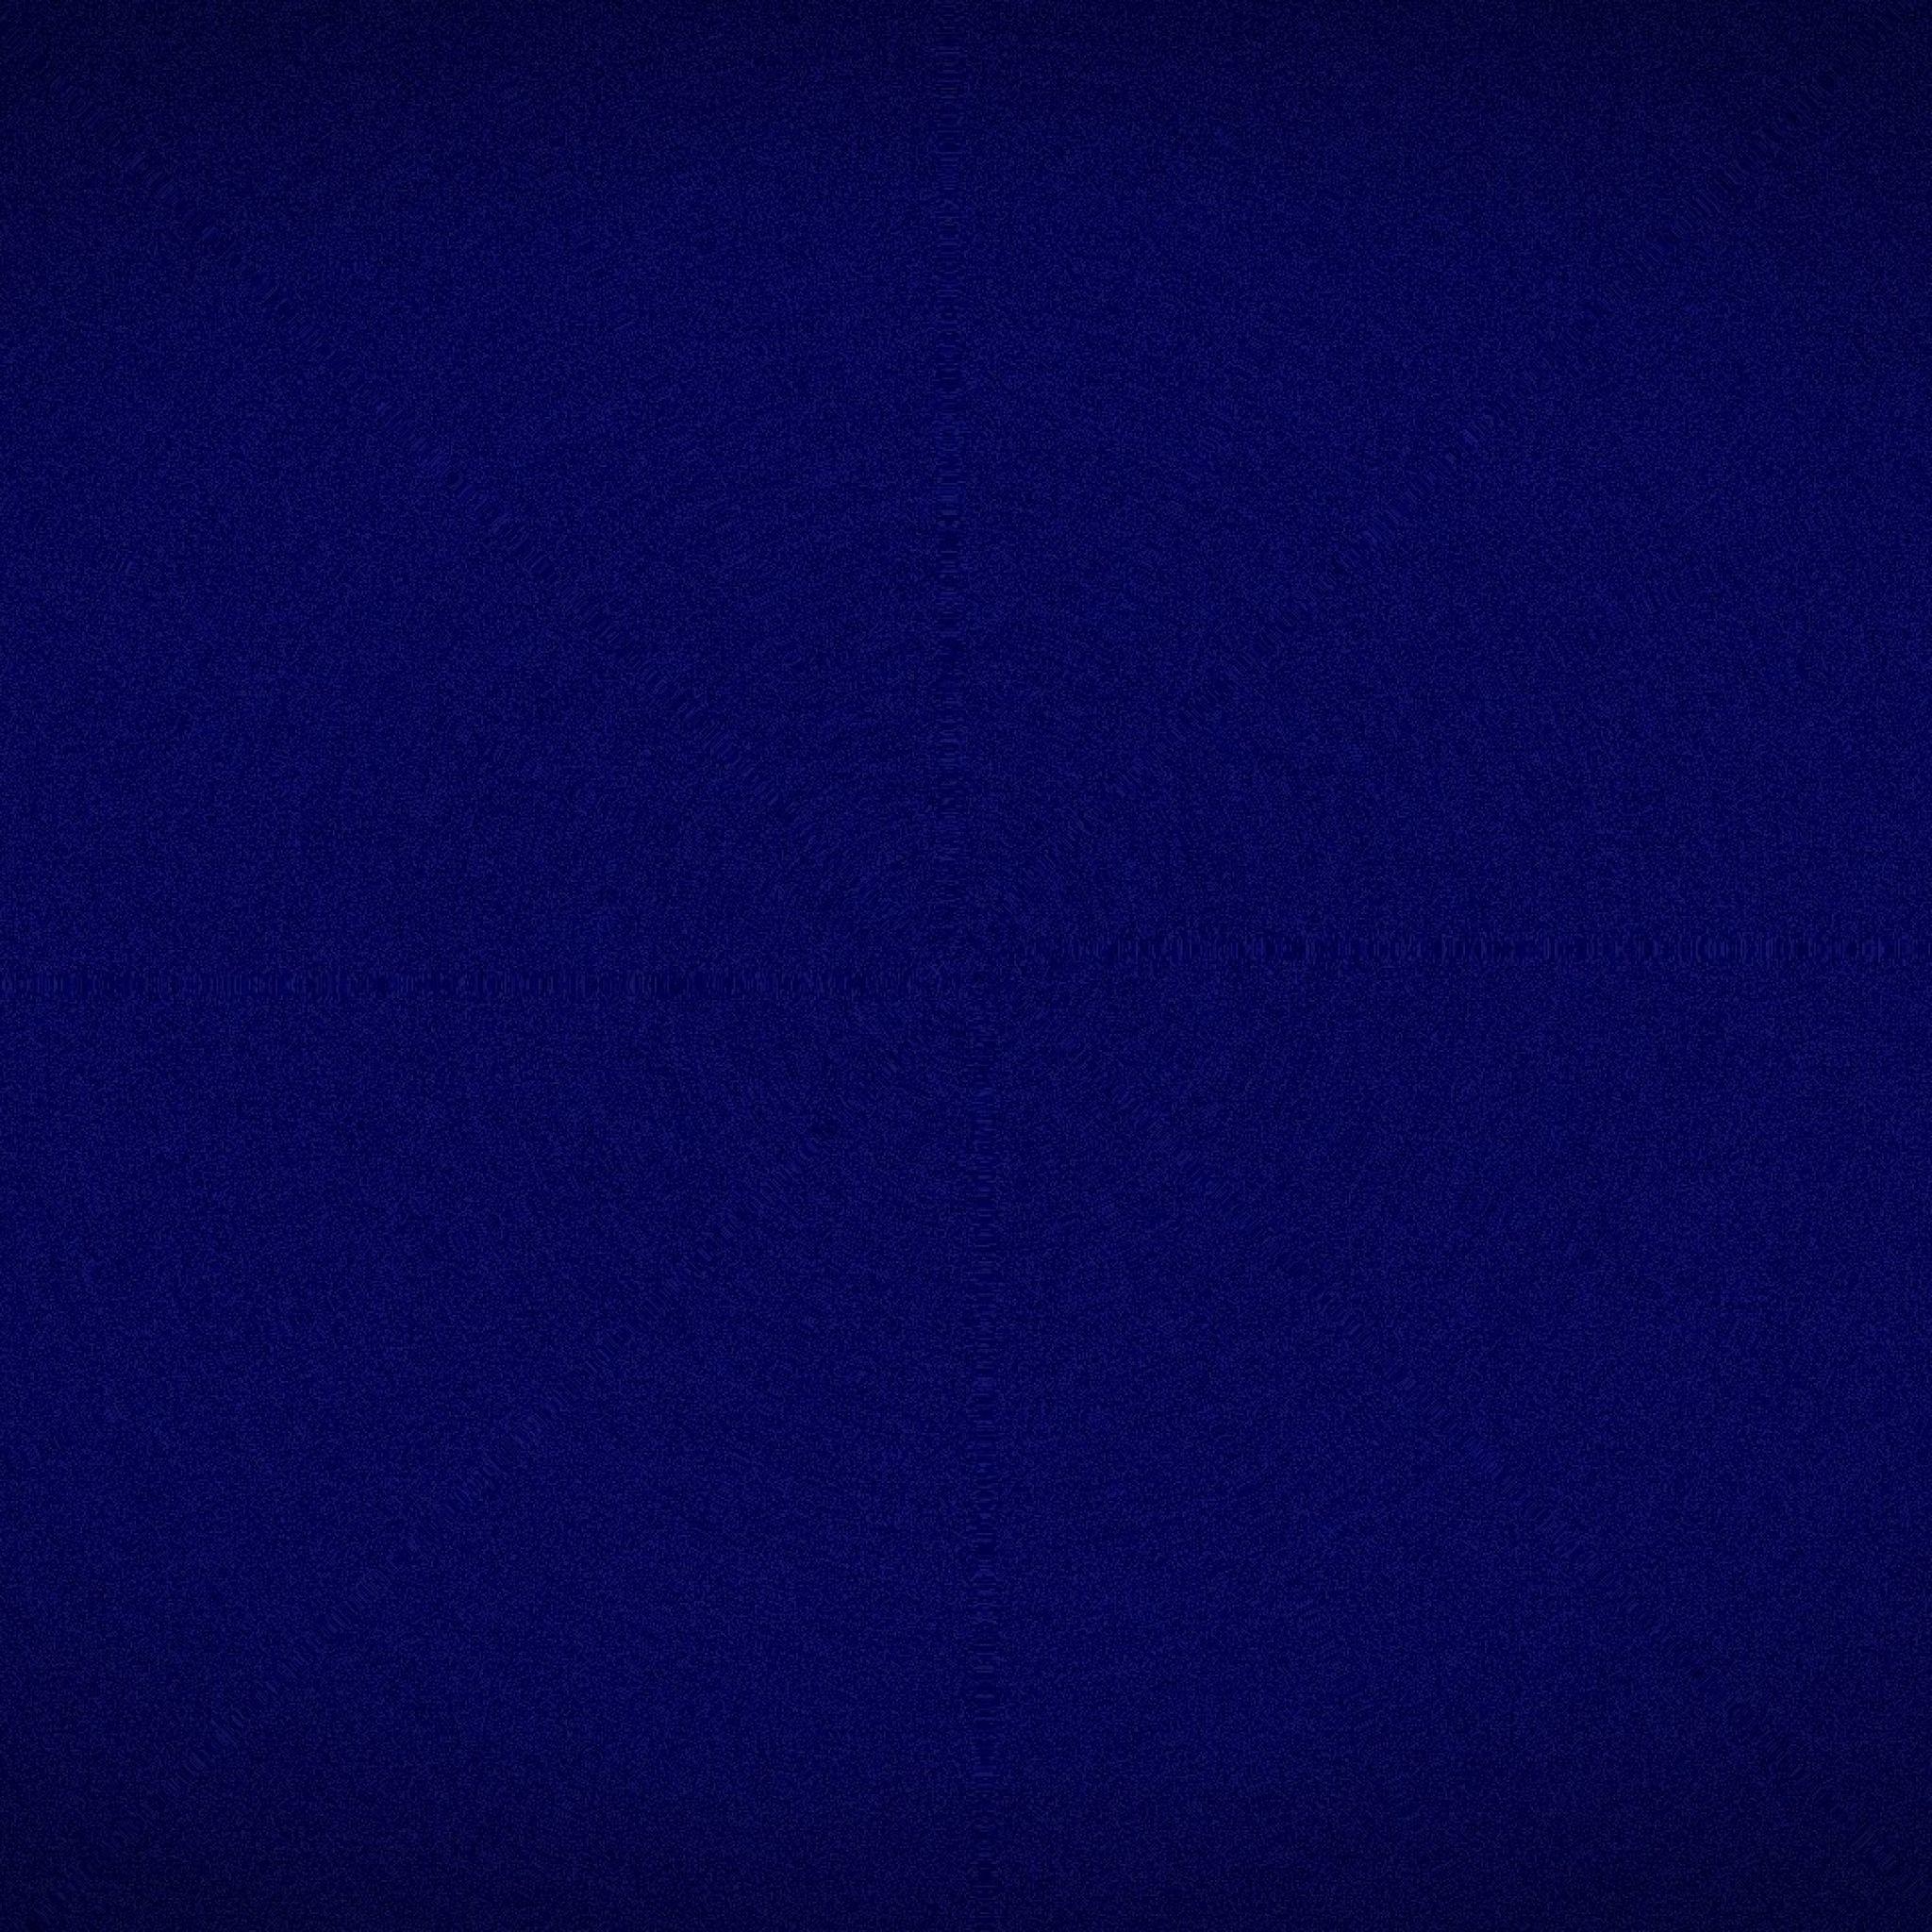 Electric Blue Wallpaper Hd 2048x2048 Wallpaper Superf 237 Cie S 243 Lido Azul Escuro